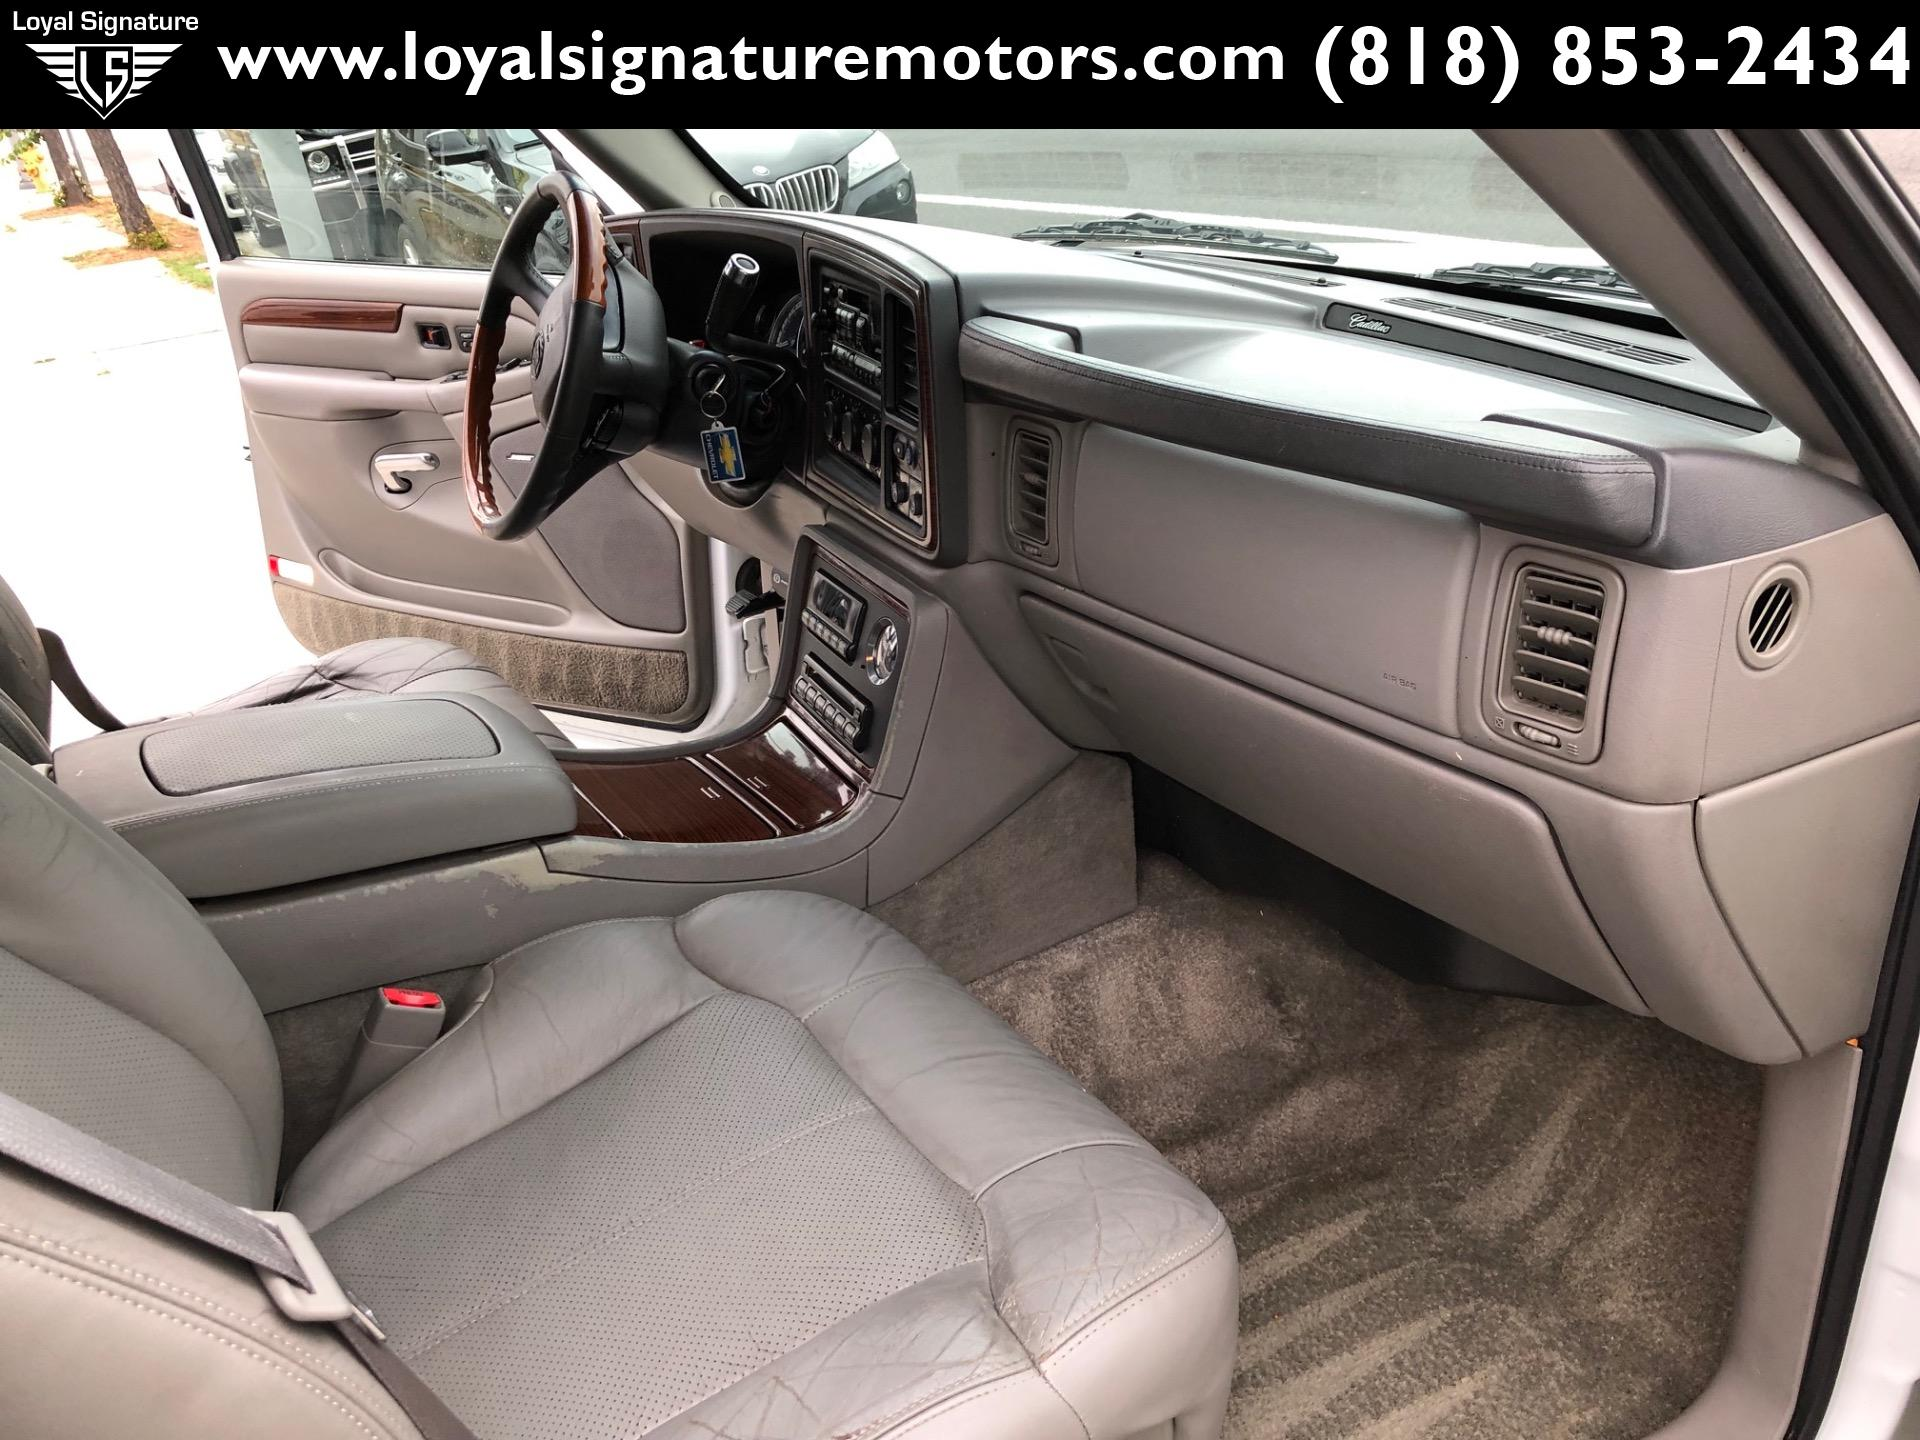 Used-2002-Cadillac-Escalade